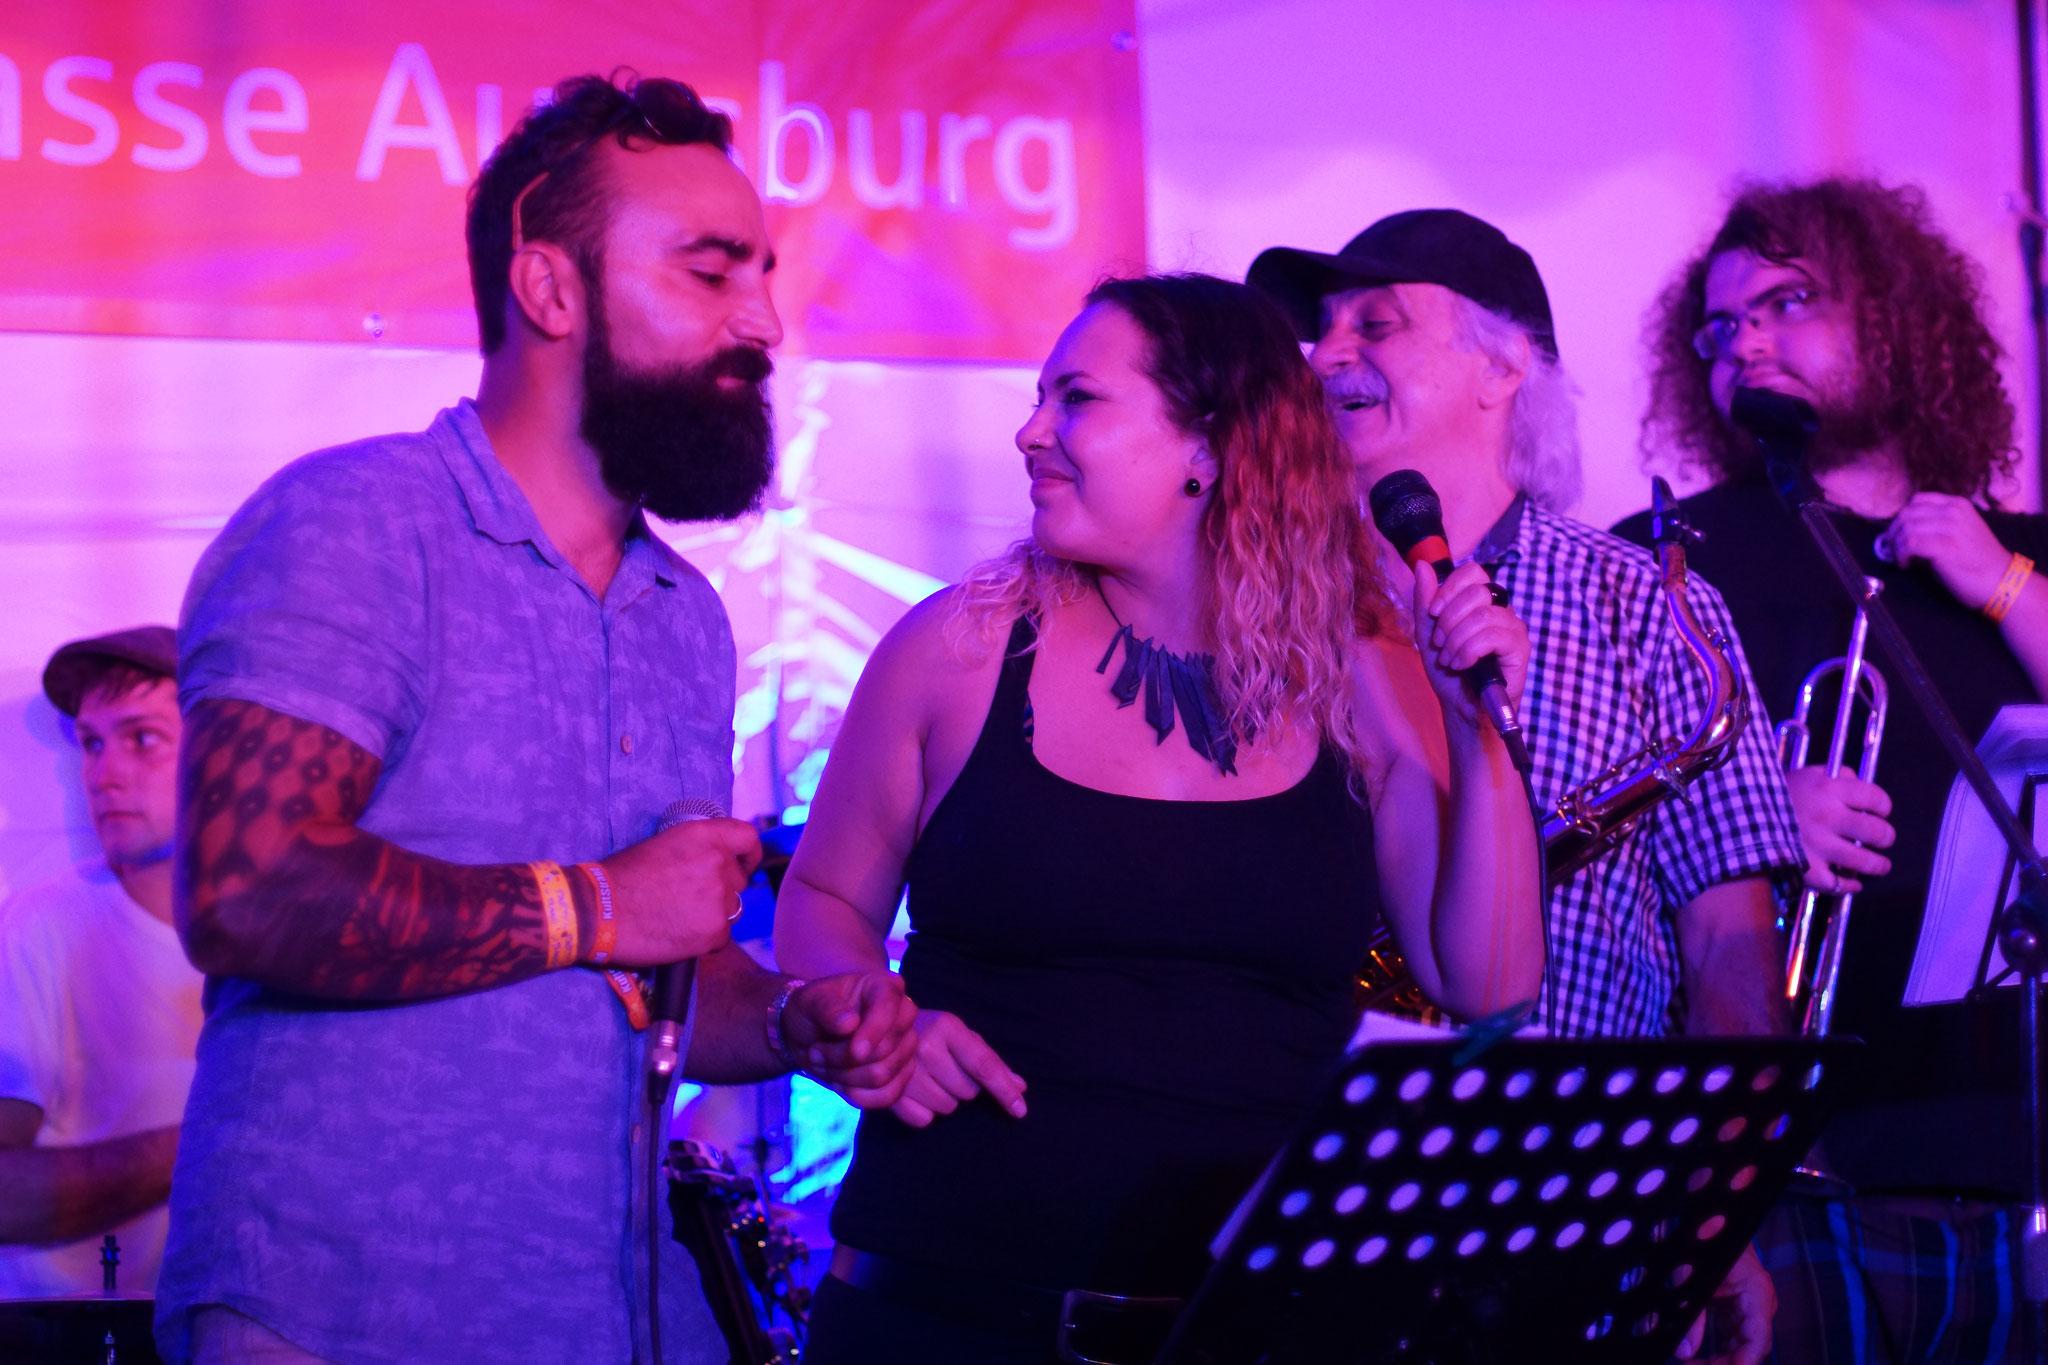 Konzerte im Bürgerhof 07.07.17 Motherfunkers - Freiwilligen-Zentrum Augsburg - Foto: Crayfish